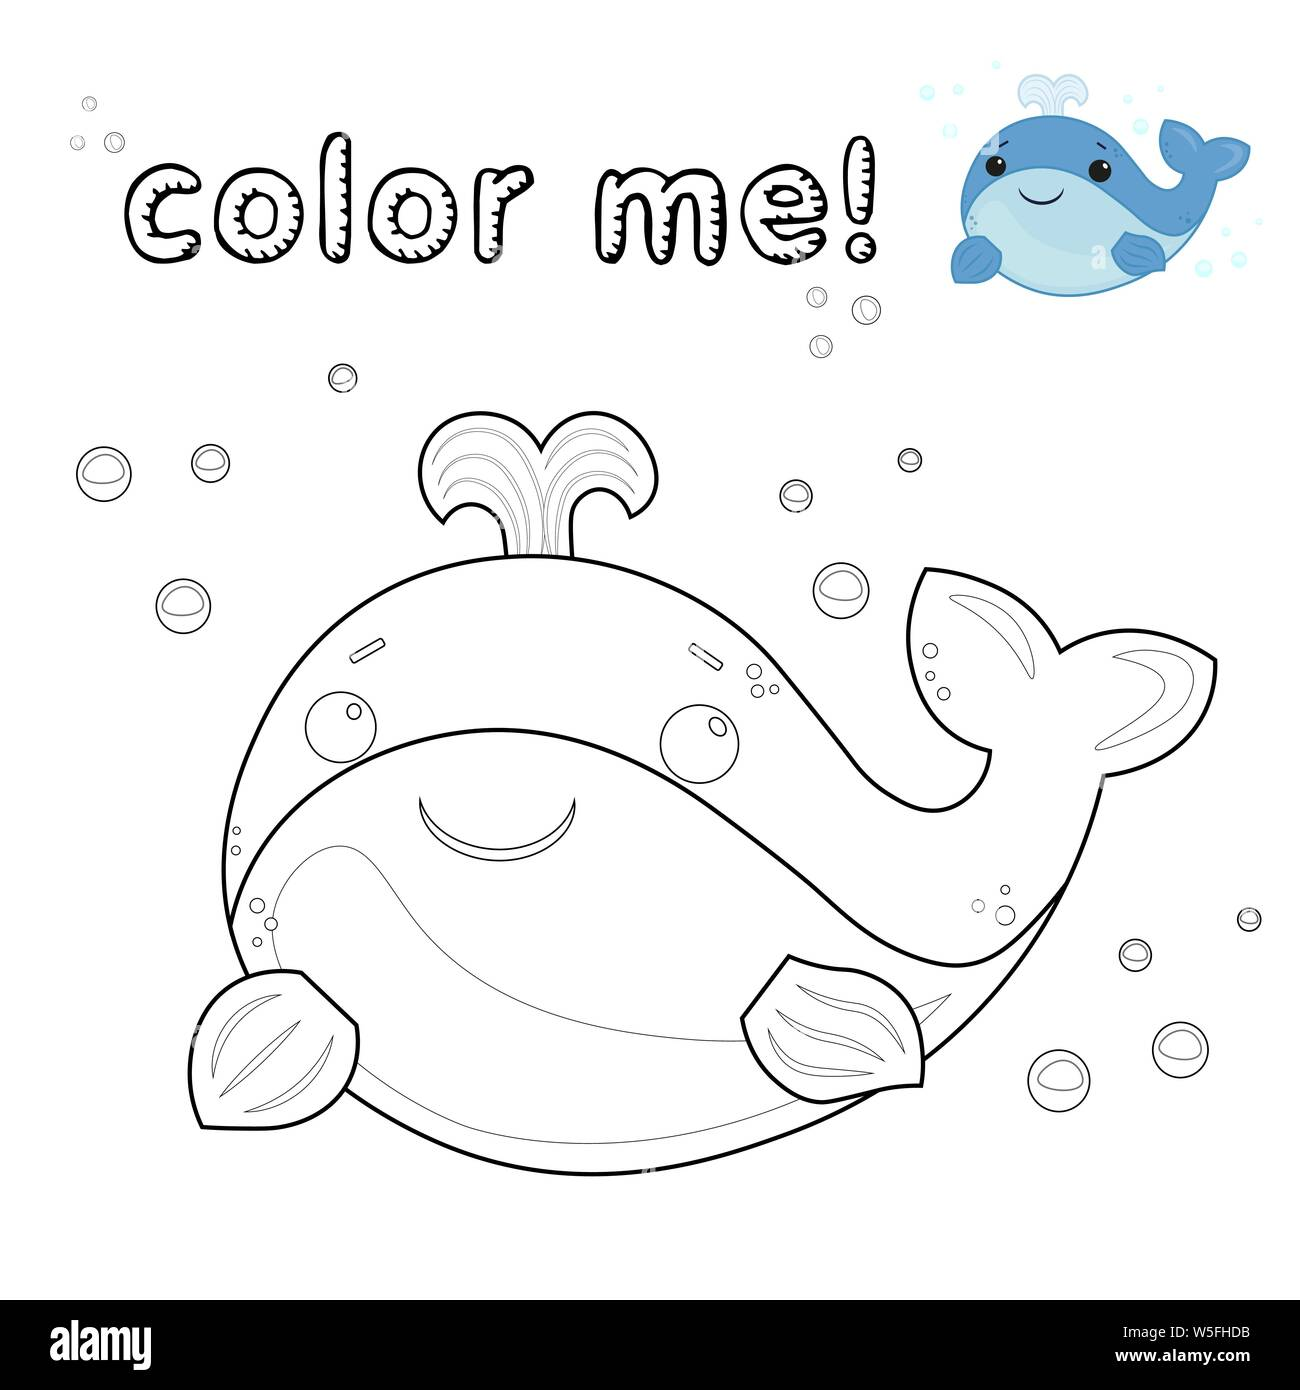 Cartoon Whale Imágenes De Stock Cartoon Whale Fotos De Stock